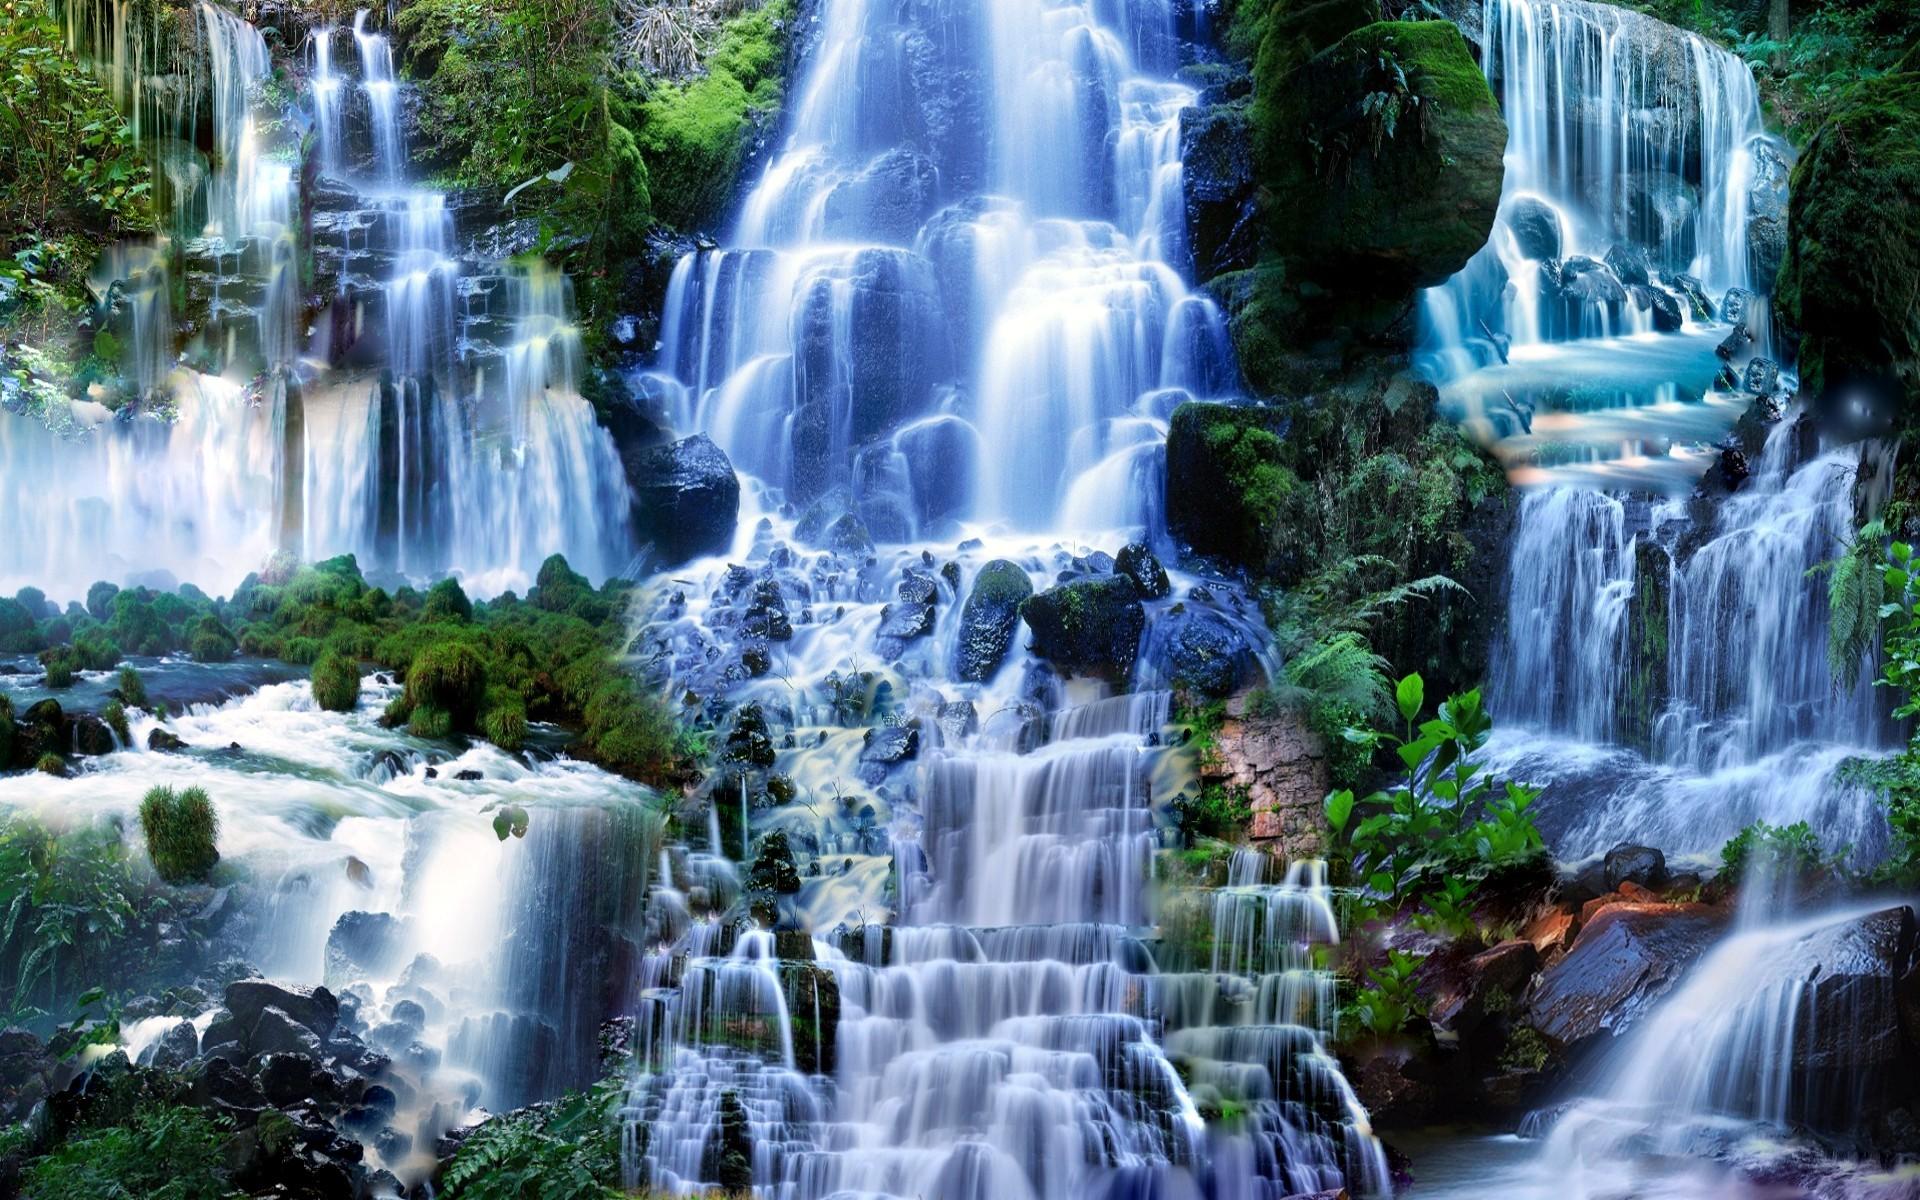 Waterfall Hd Wallpaper Background Image 1920x1200 Id